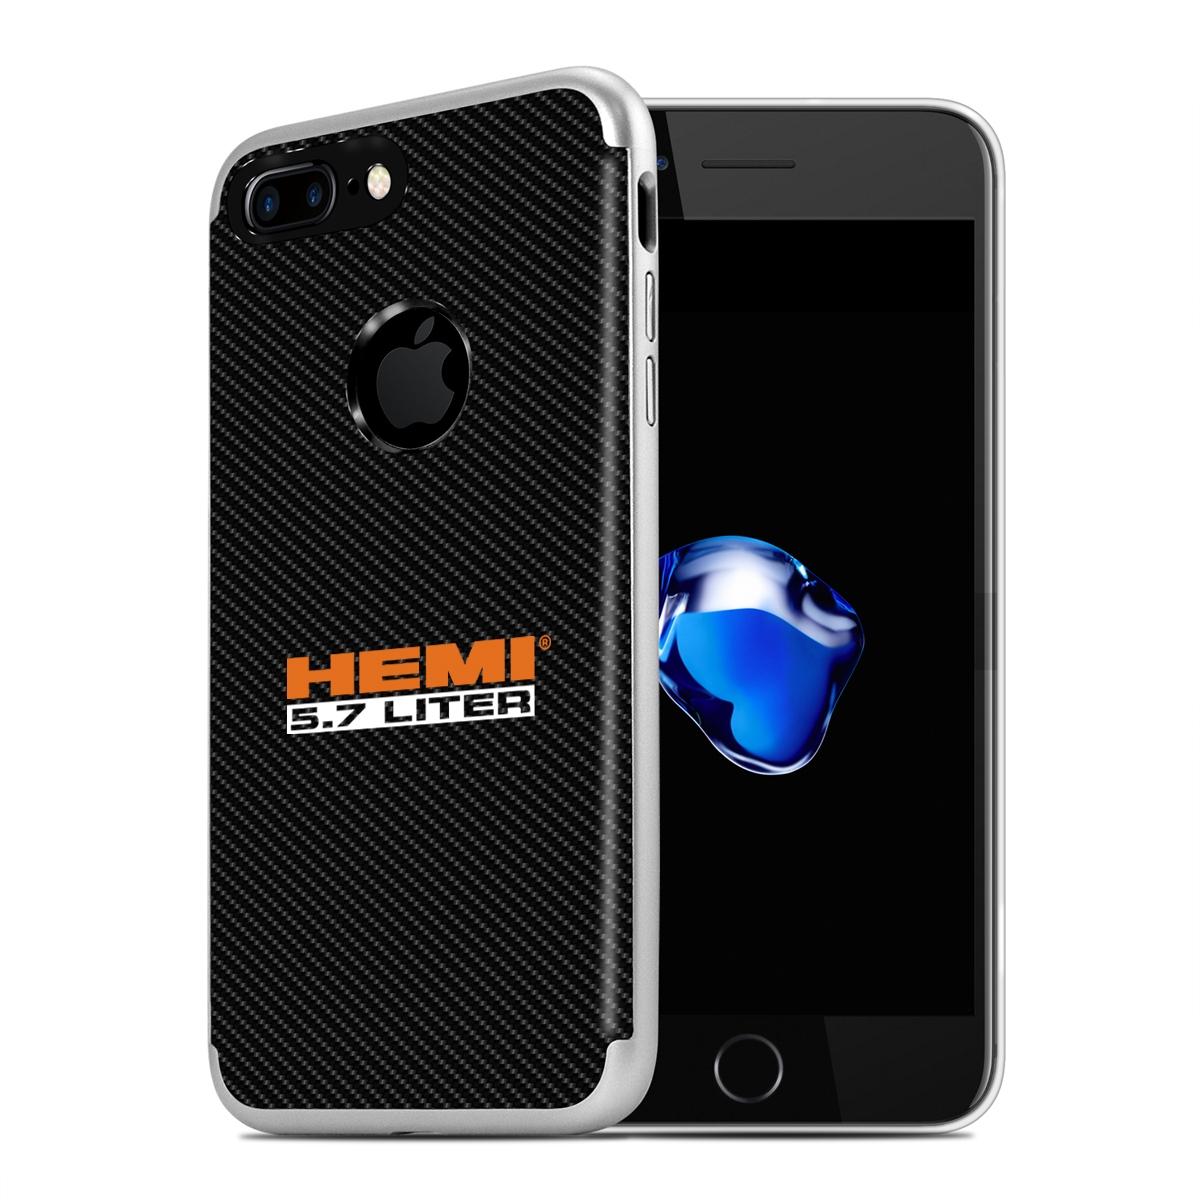 iPhone 7 Plus Case, HEMI 5.7 Liter PC+TPU Shockproof Black Carbon Fiber Textures Cell Phone Case